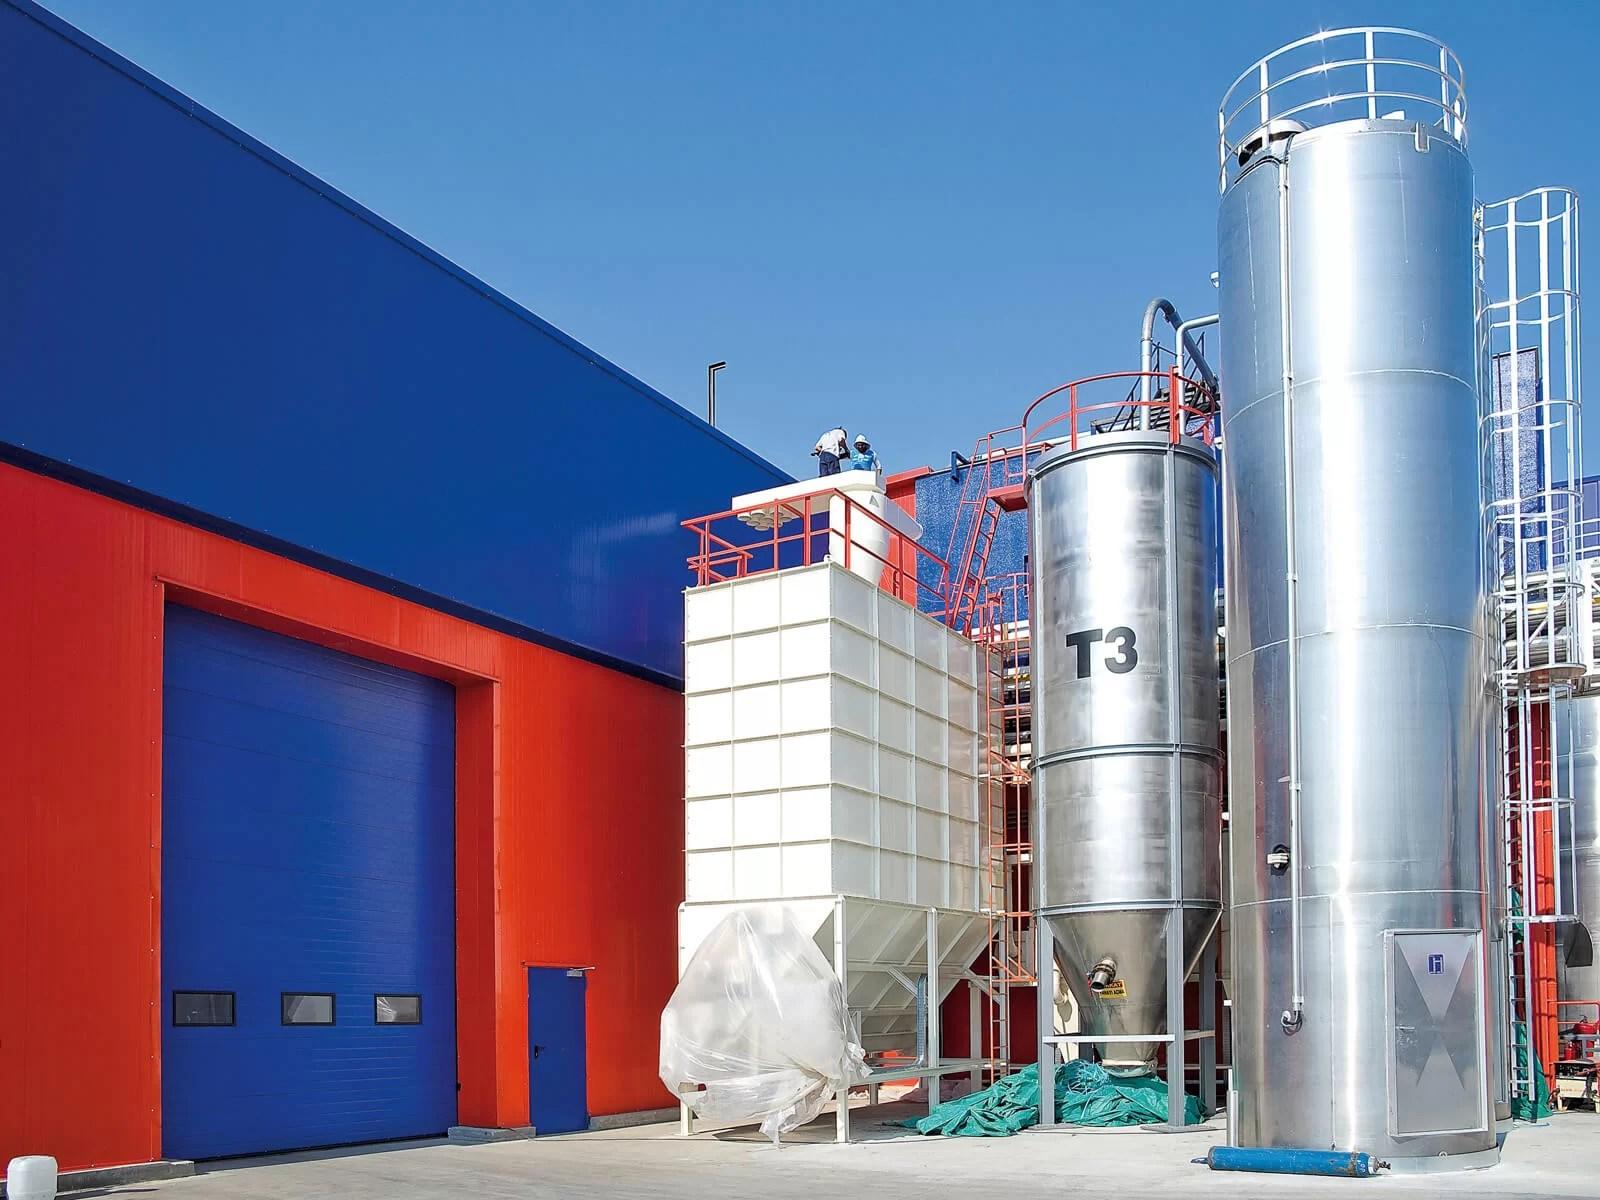 Portone sezionale industriale SECURA - Stucco blu RAL 5010